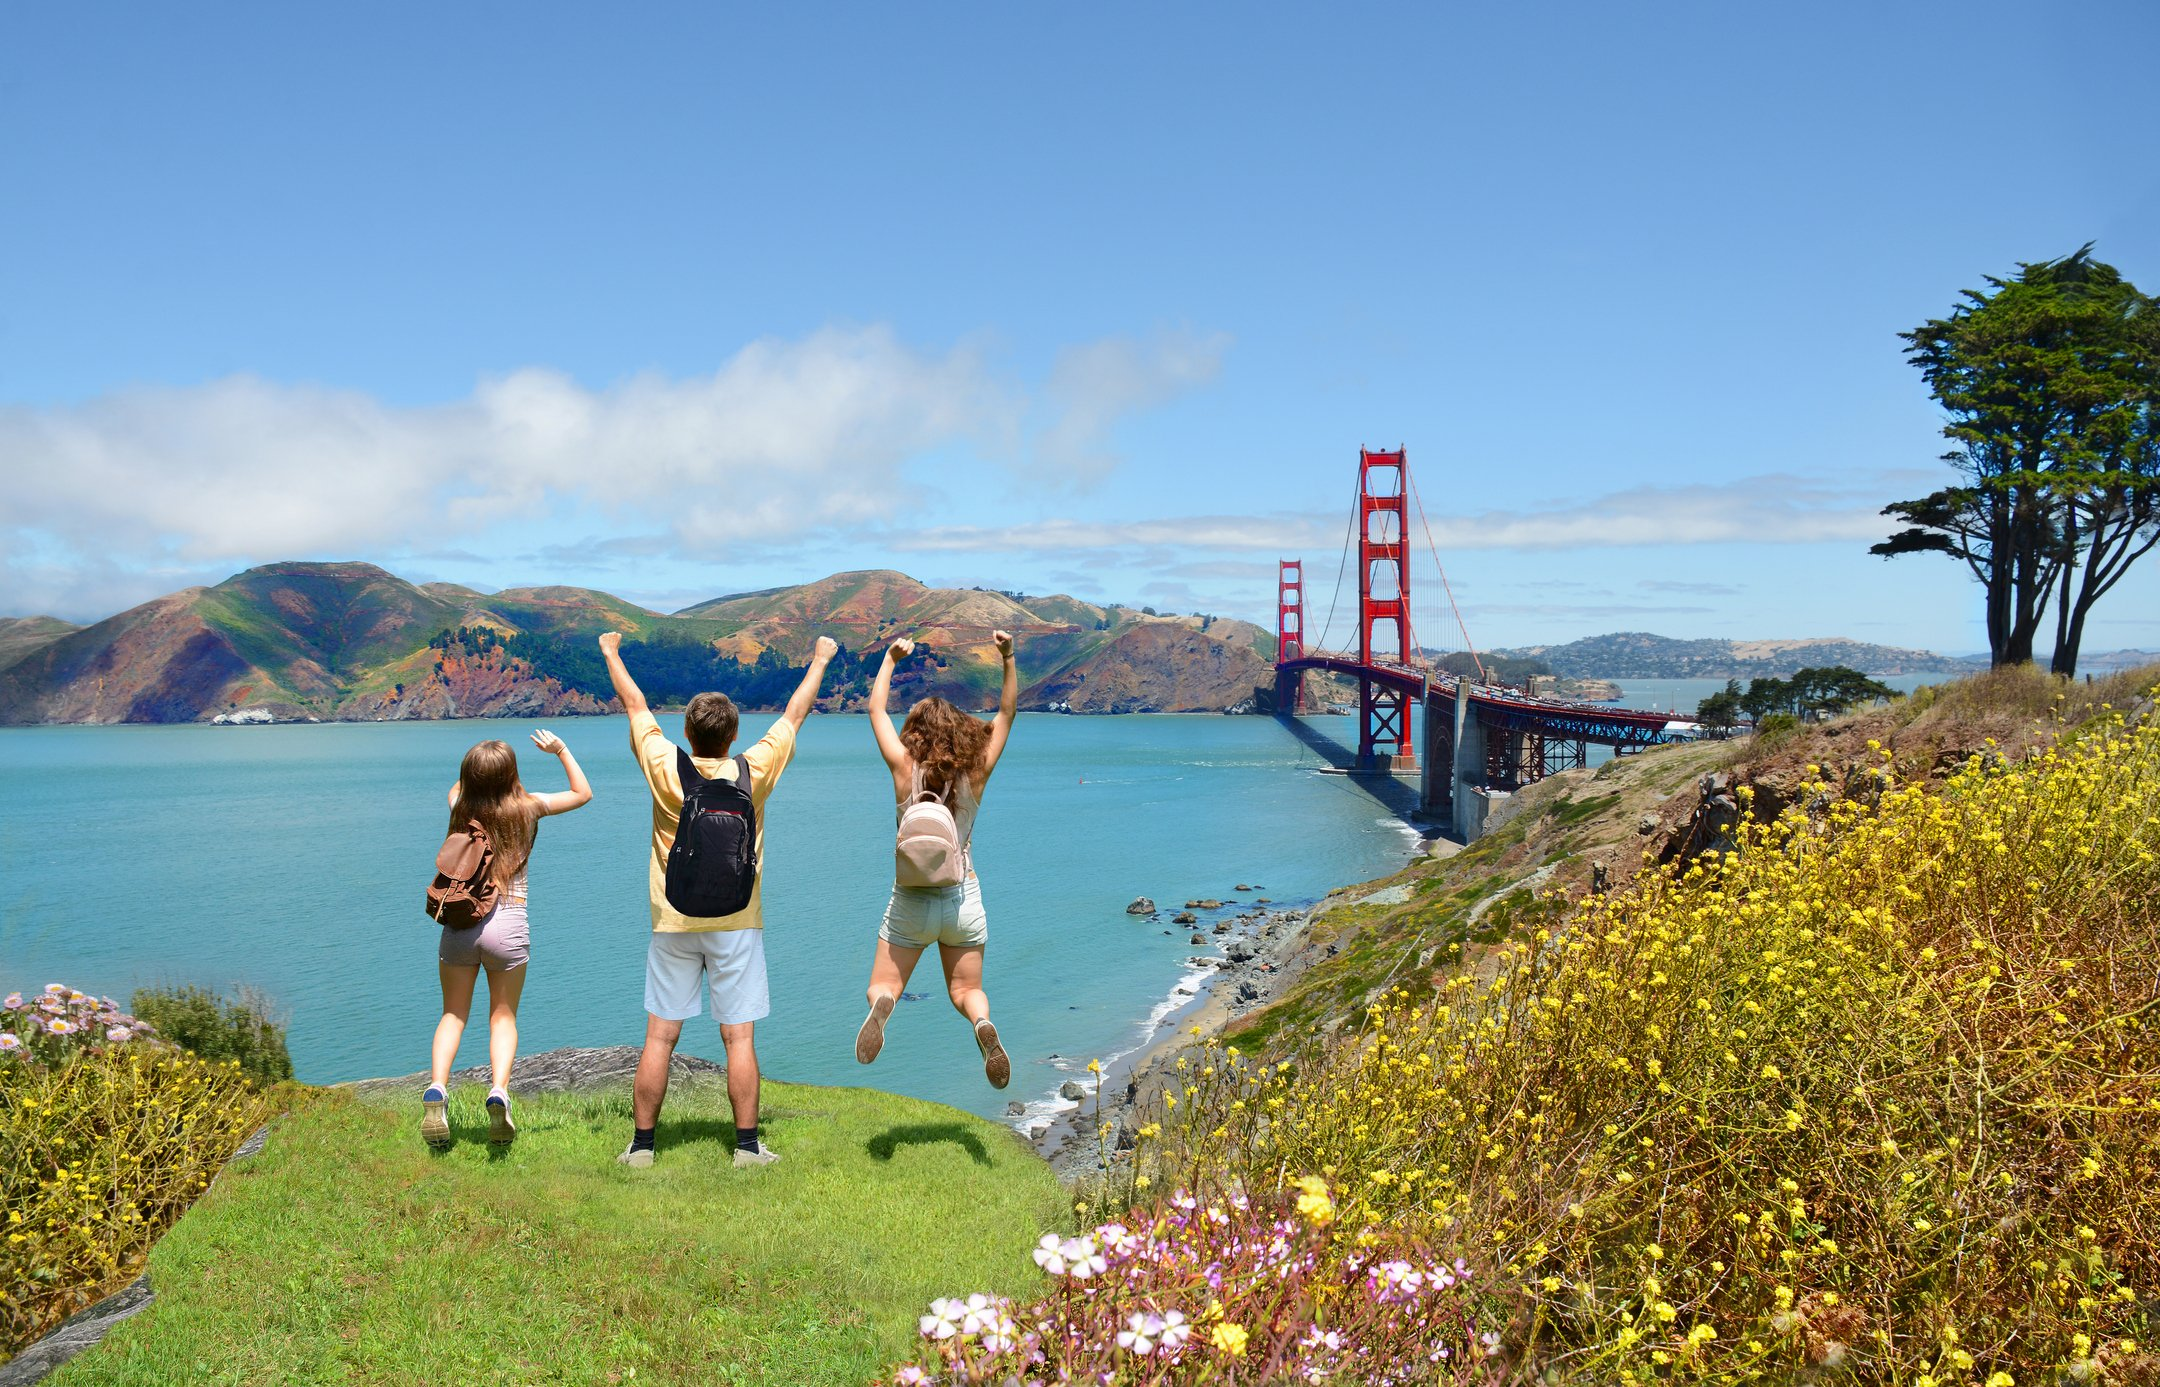 A family jumps in the air near the Golden Gate Bridge.